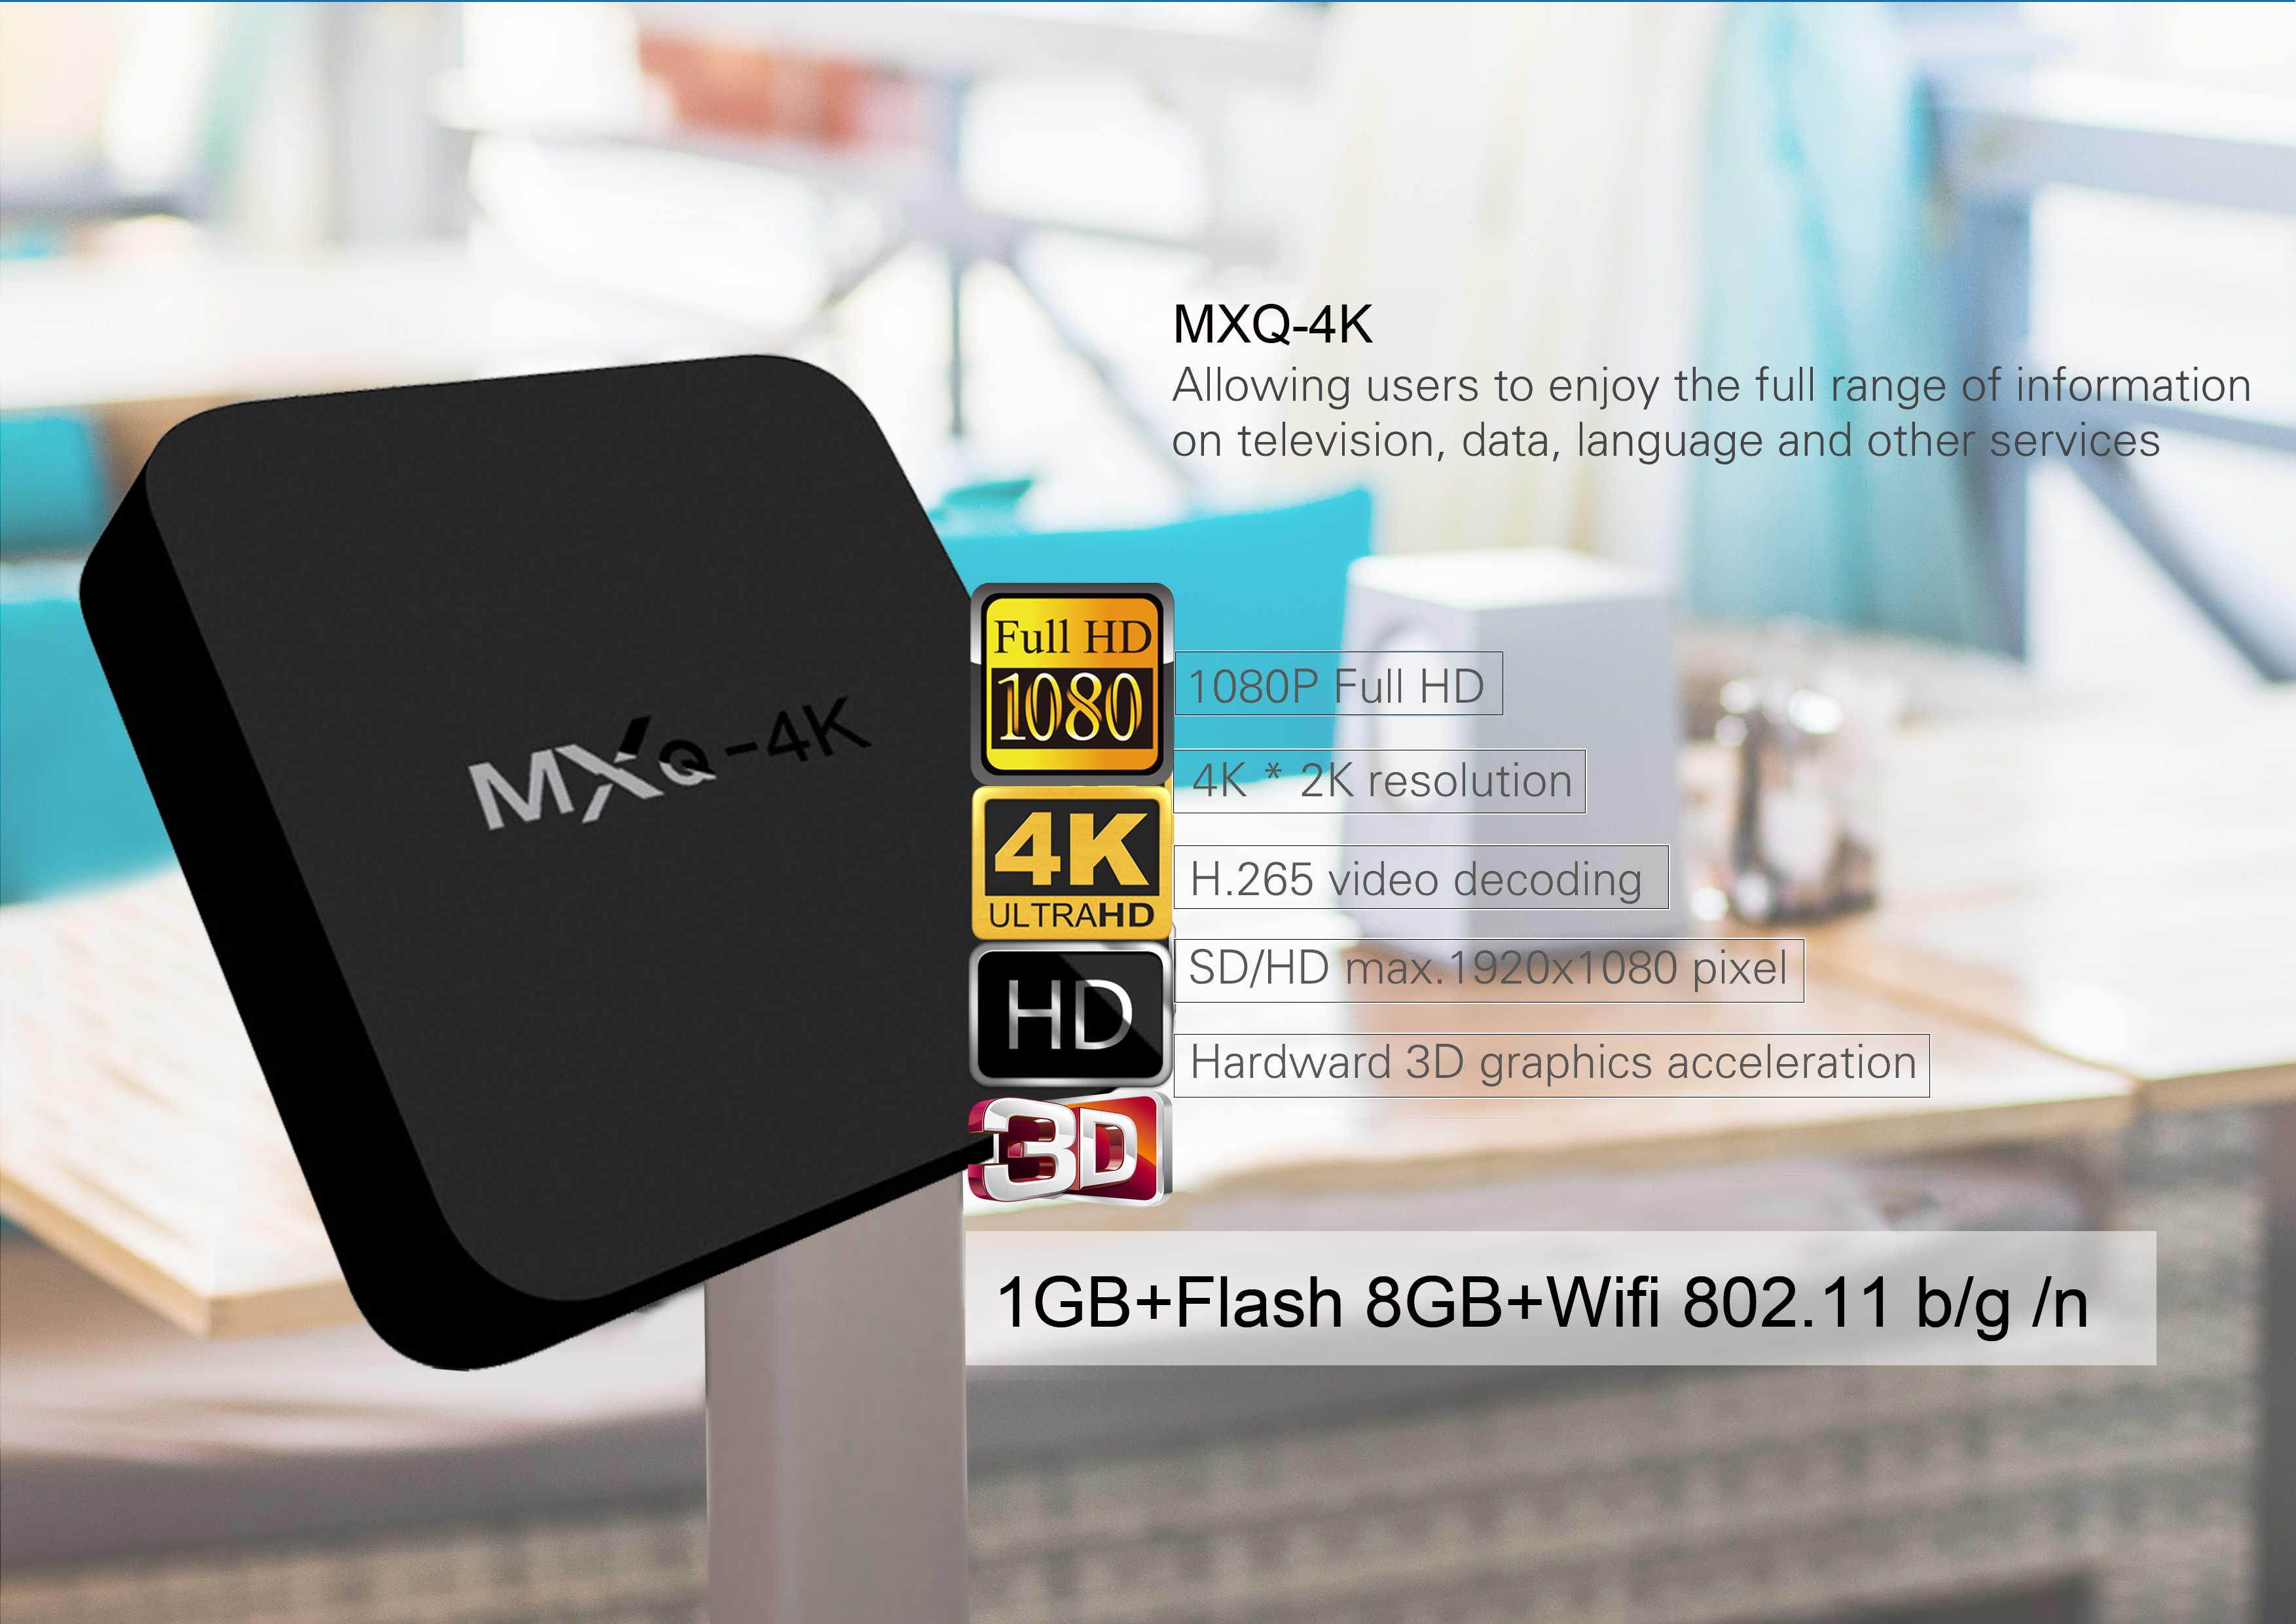 Mxq 4k France Canada Dubai Japan Spain India Brazil Italy Australia Mexico  Android Iptv Stb Set Top Box - Buy Usa Uk Germany Ott Xmbc Wifi 2 4g Kodi